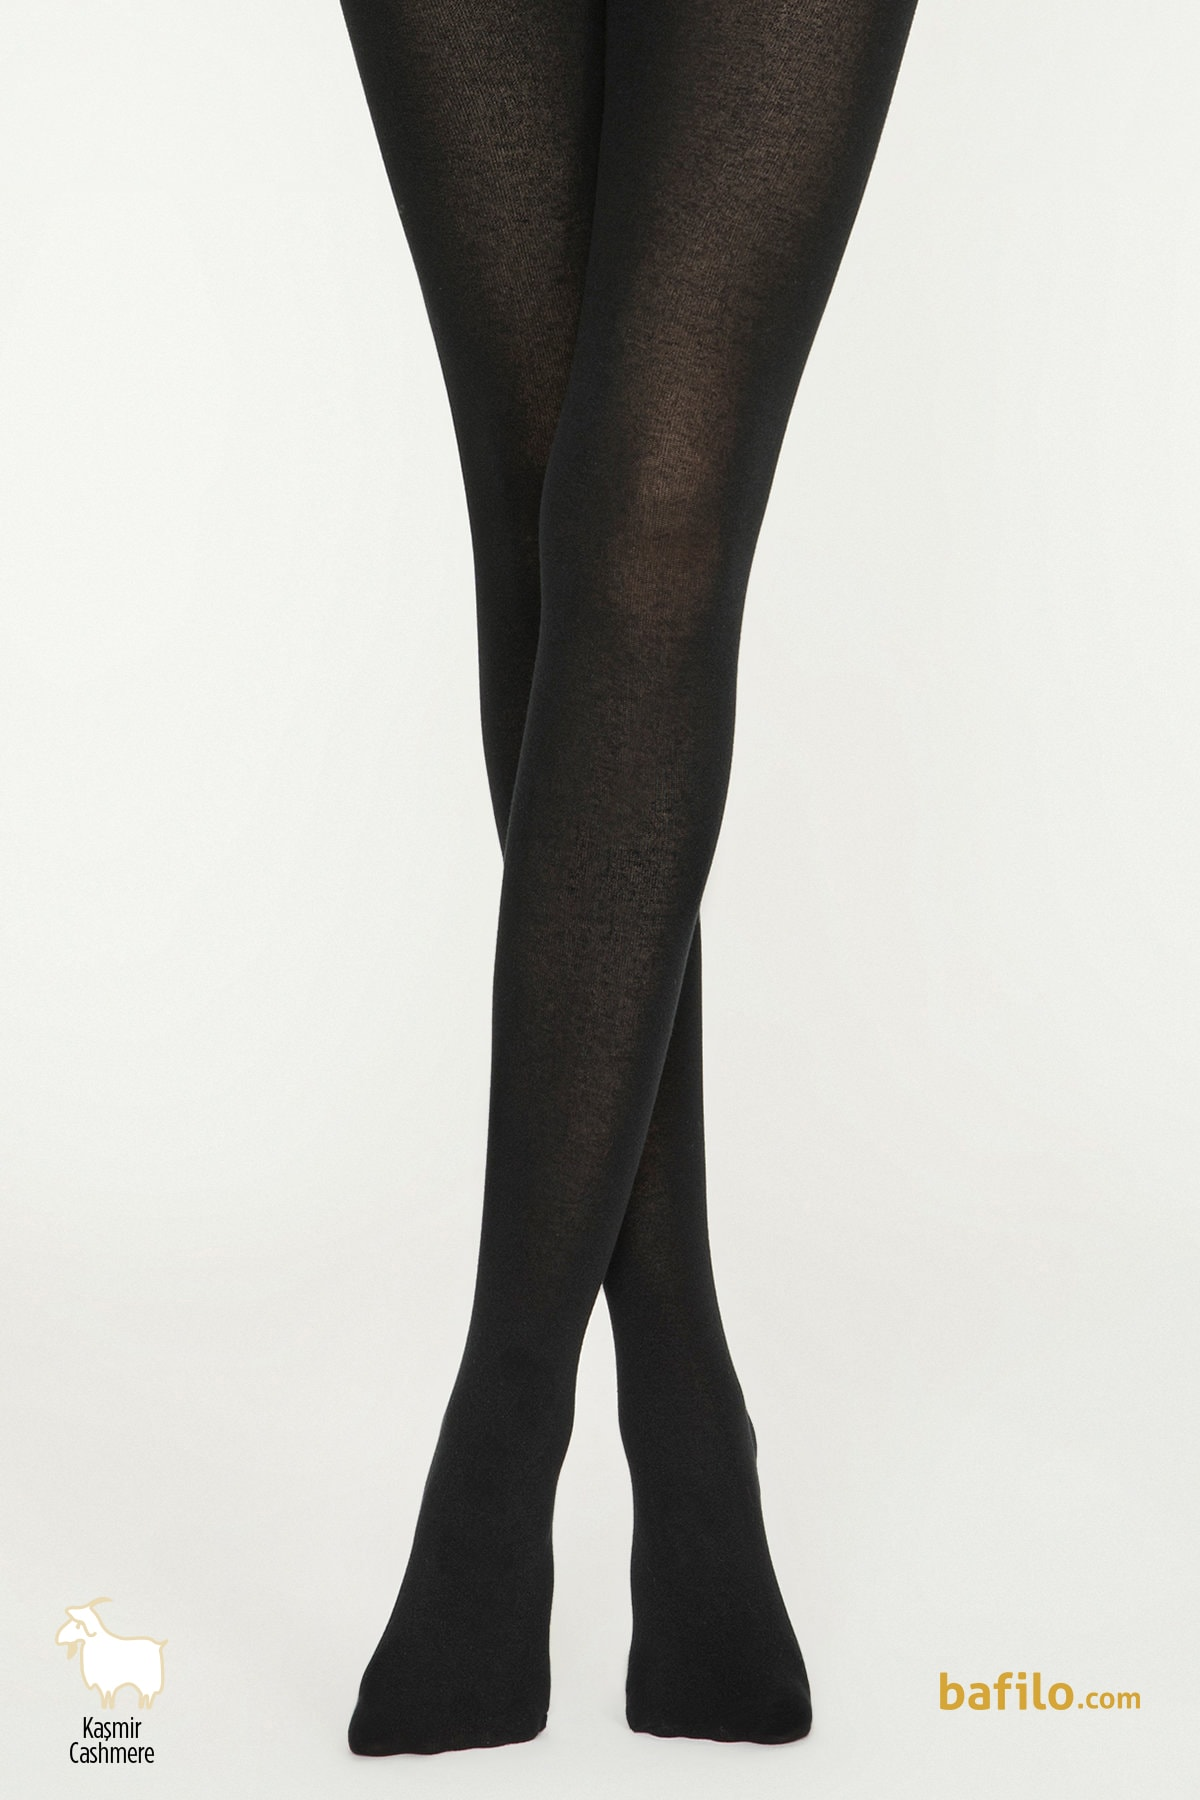 پنتی | Penti - جوراب شلواری کشمیر زنانه Penti مشکی